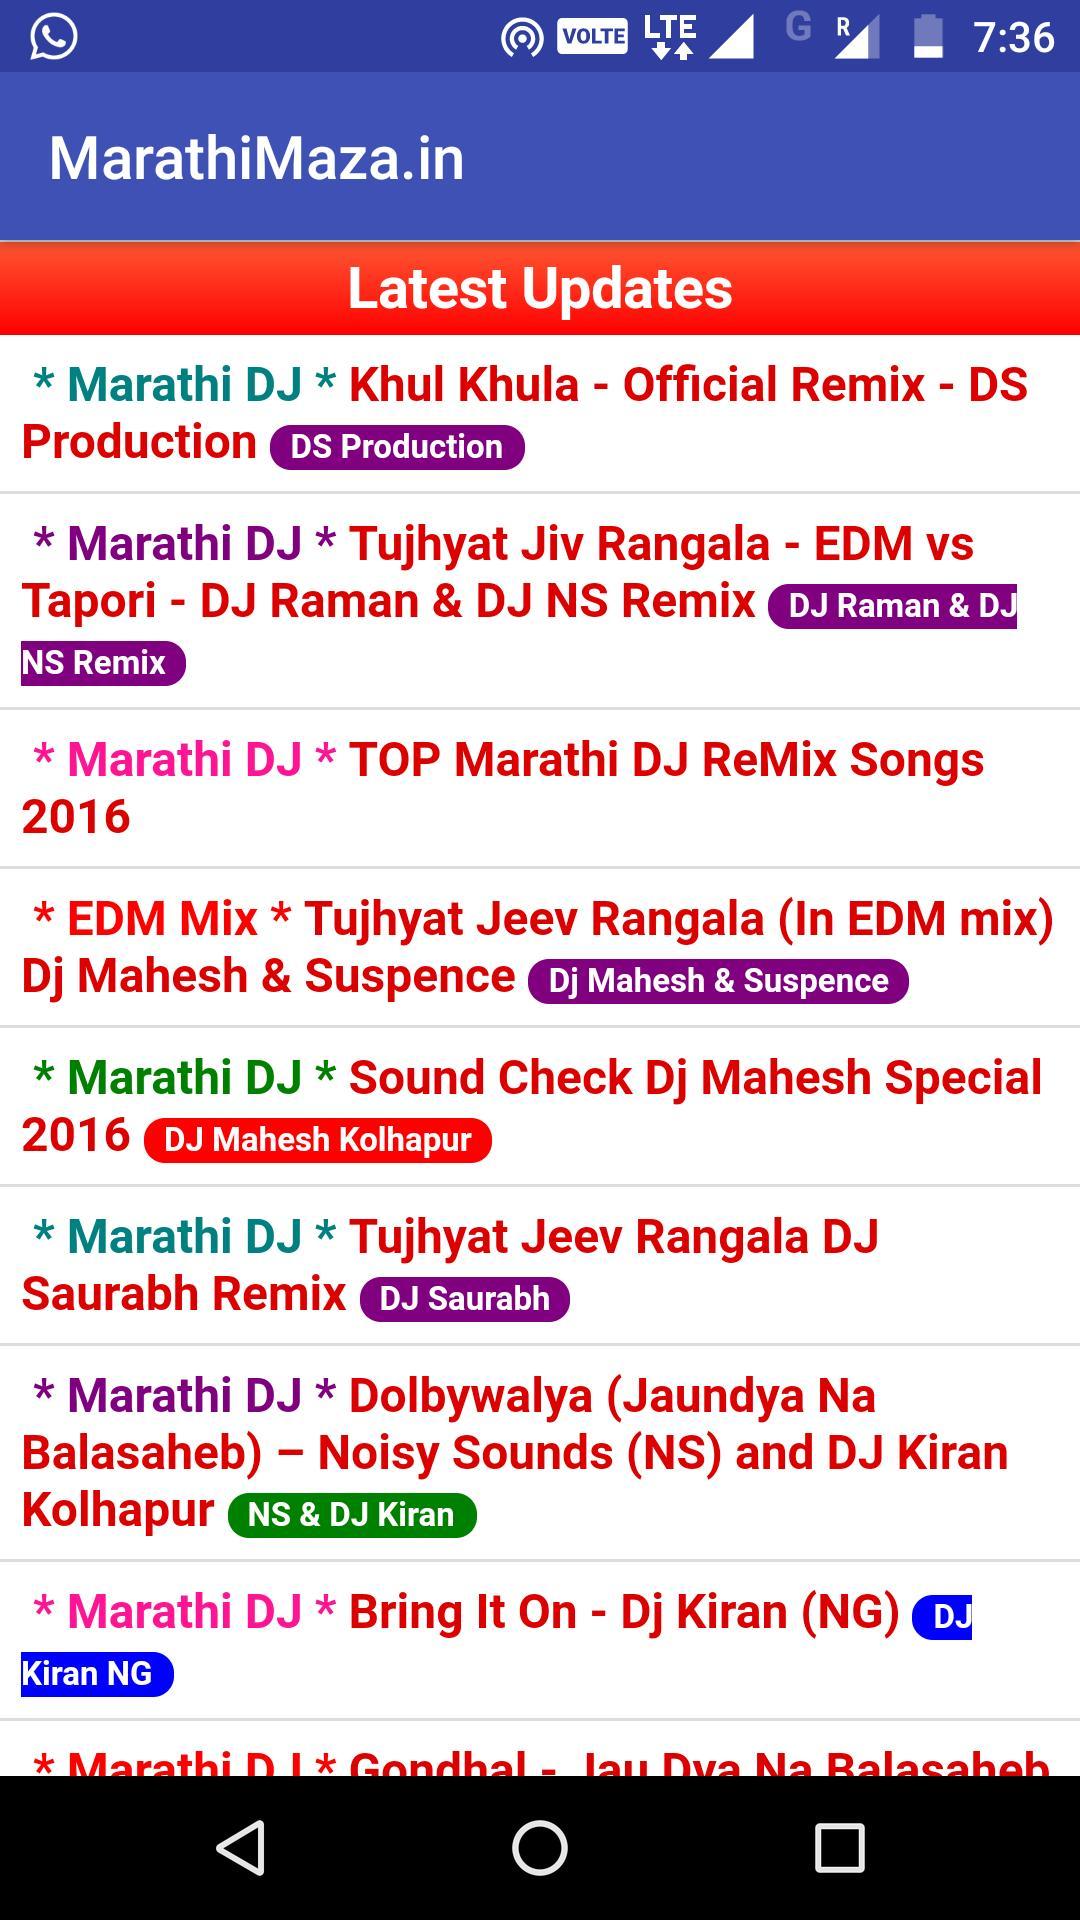 MarathiMaza - Marathi DJ Songs for Android - APK Download